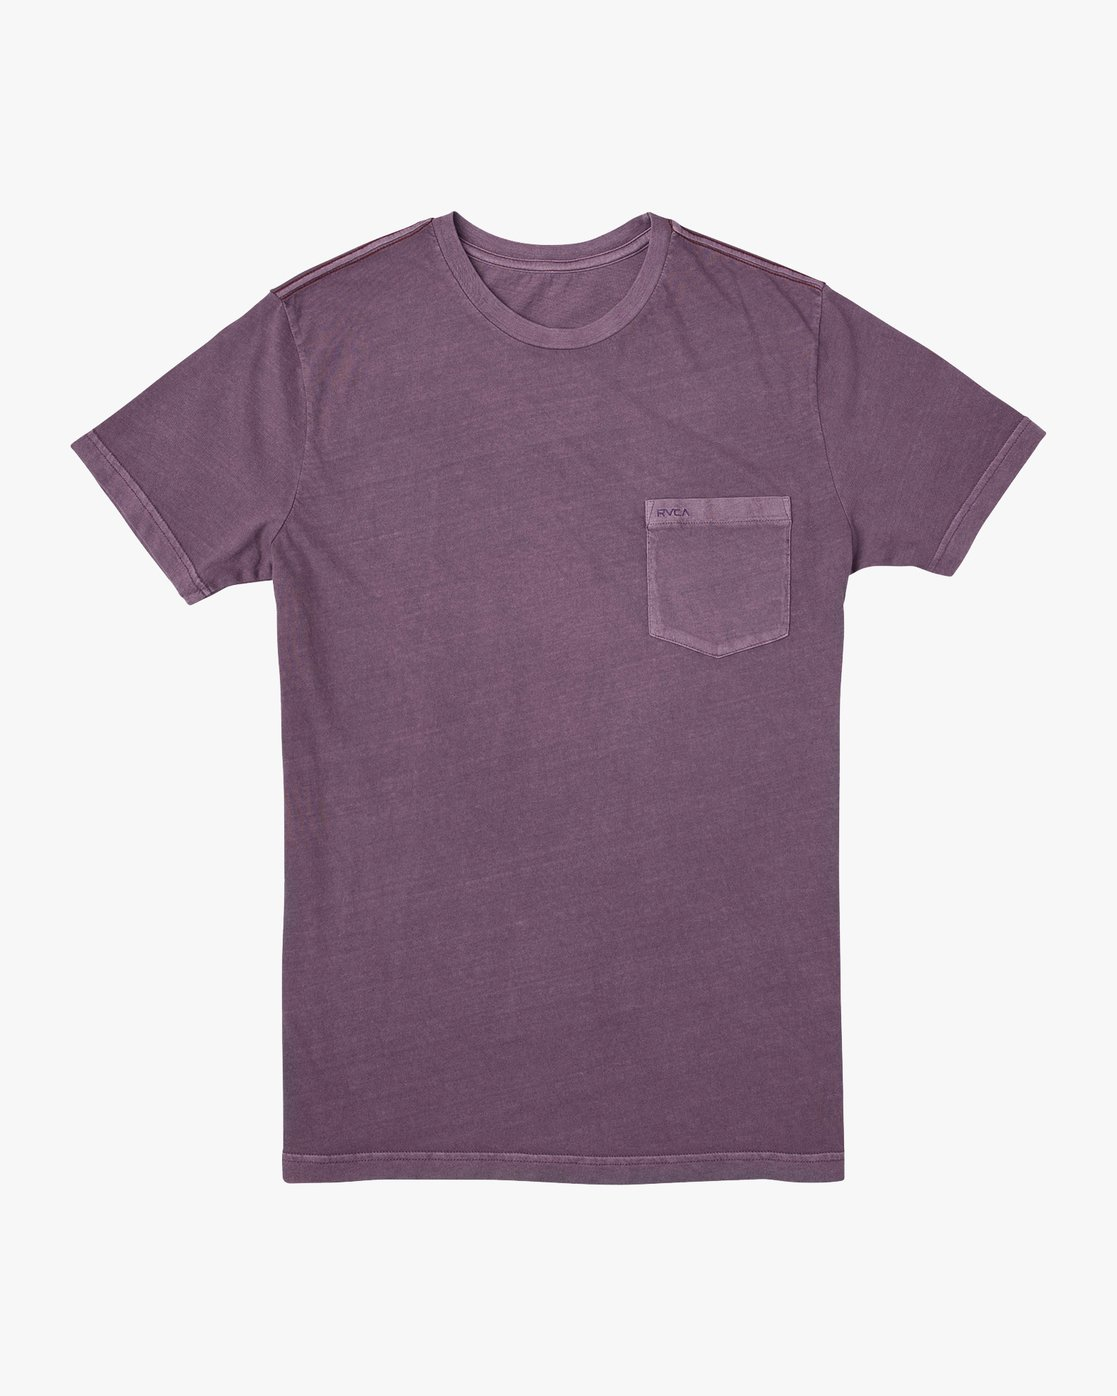 0 PTC 2 Pigment T-Shirt Blue M437VRPT RVCA